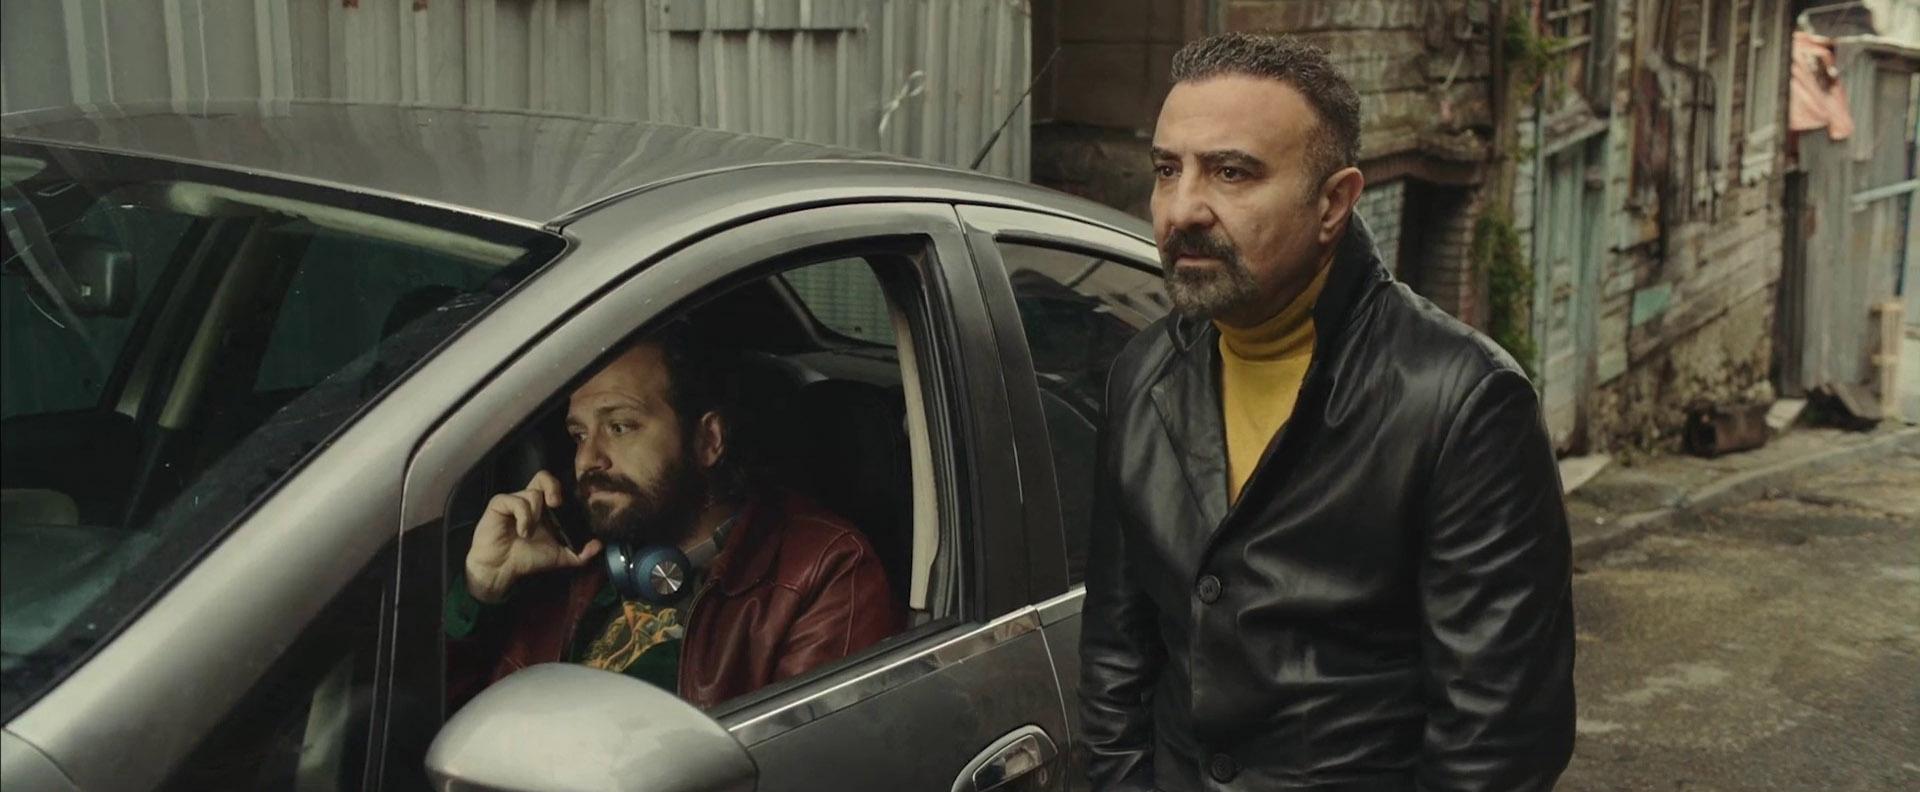 Cinayet Süsü | 2020 | Yerli Film | NF | WEB-DL | XviD | Sansürsüz | 1080p - m720p - m1080p | WEB-DL | Tek Link